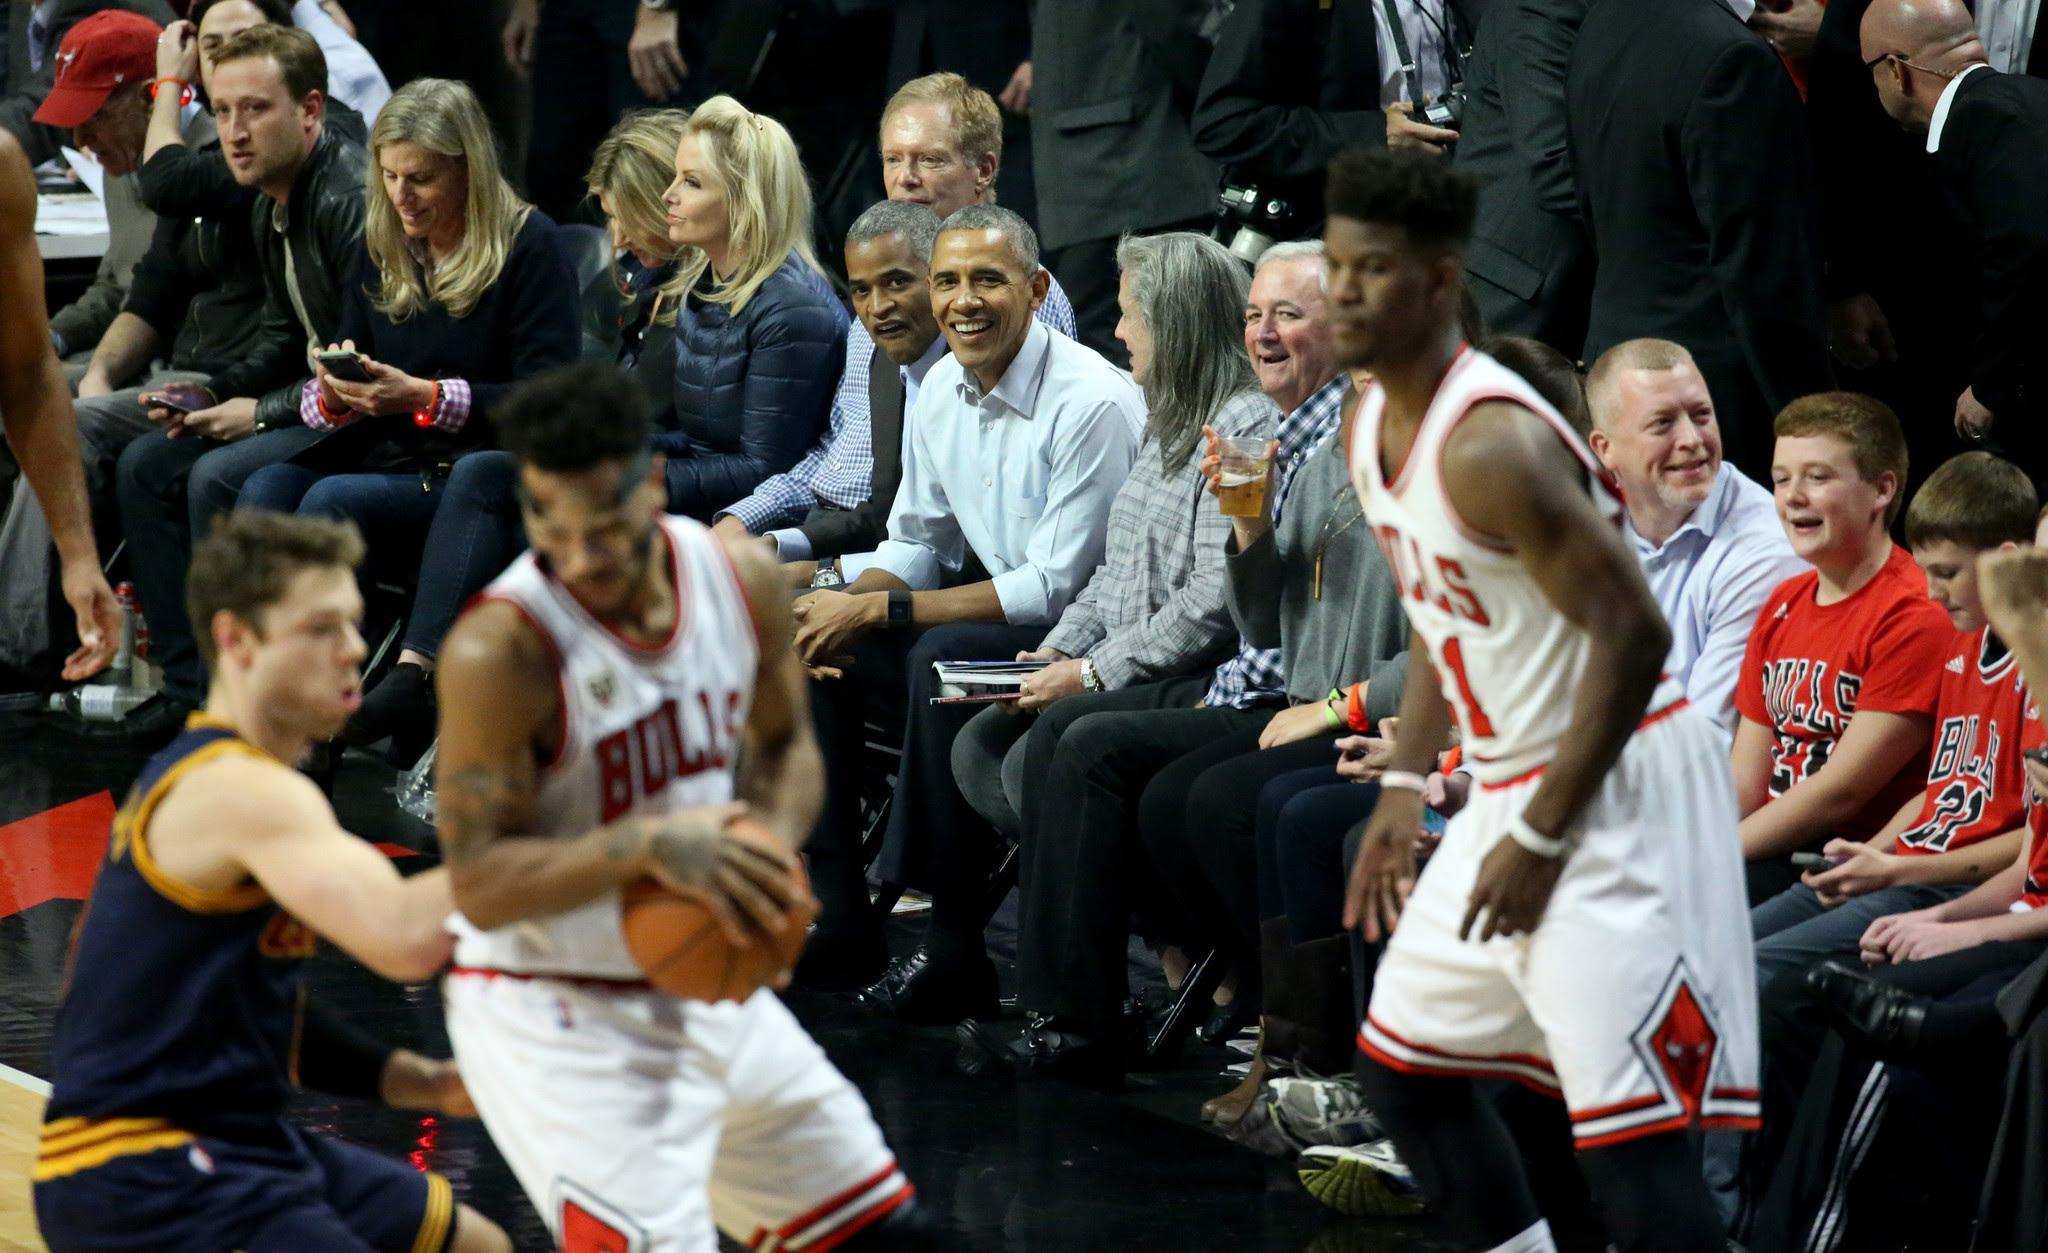 President Obama enjoying a game of basketball